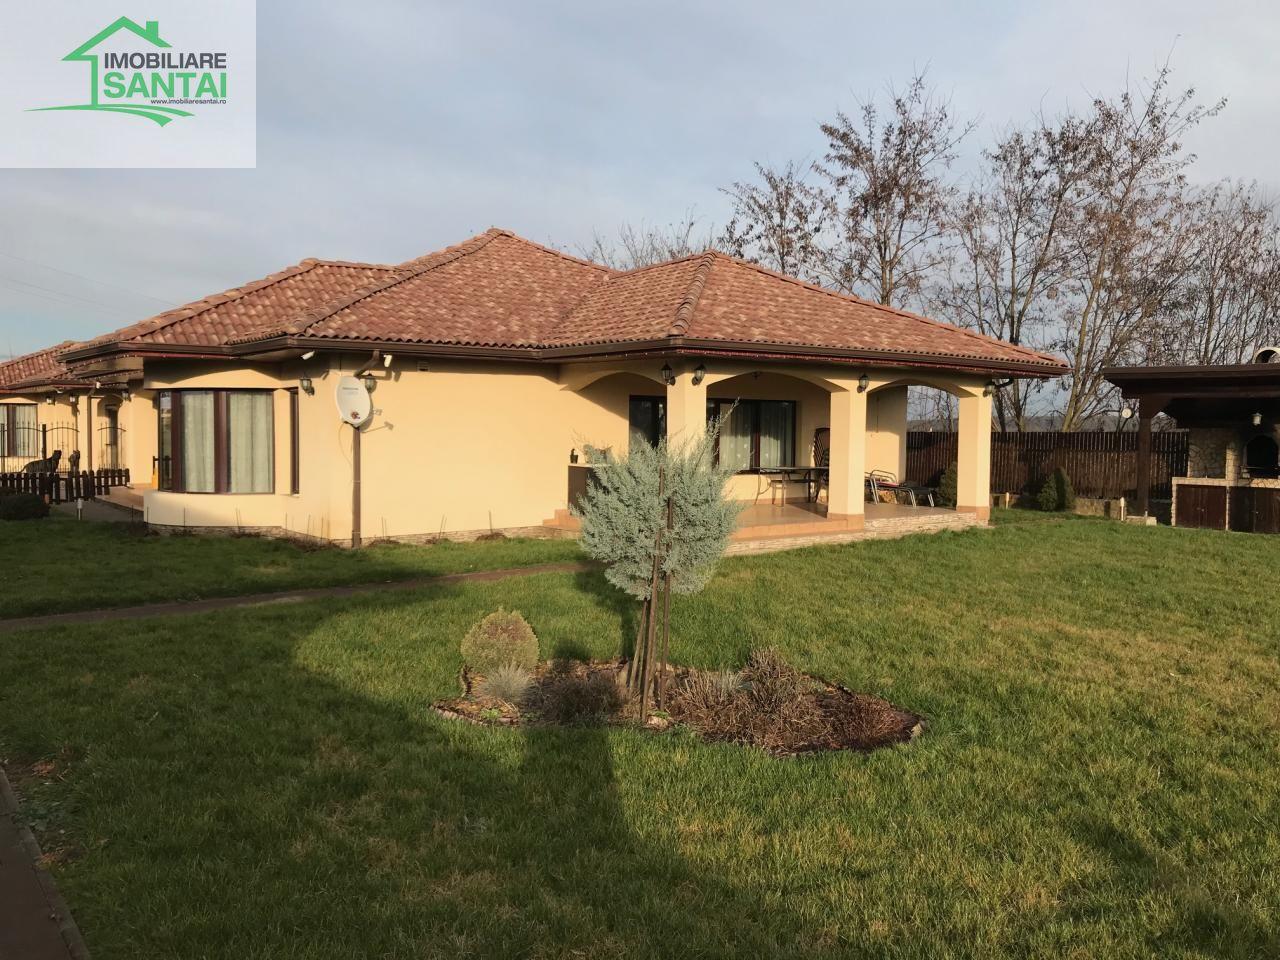 Casa de vanzare, Satu Mare (judet), Lazuri - Foto 1